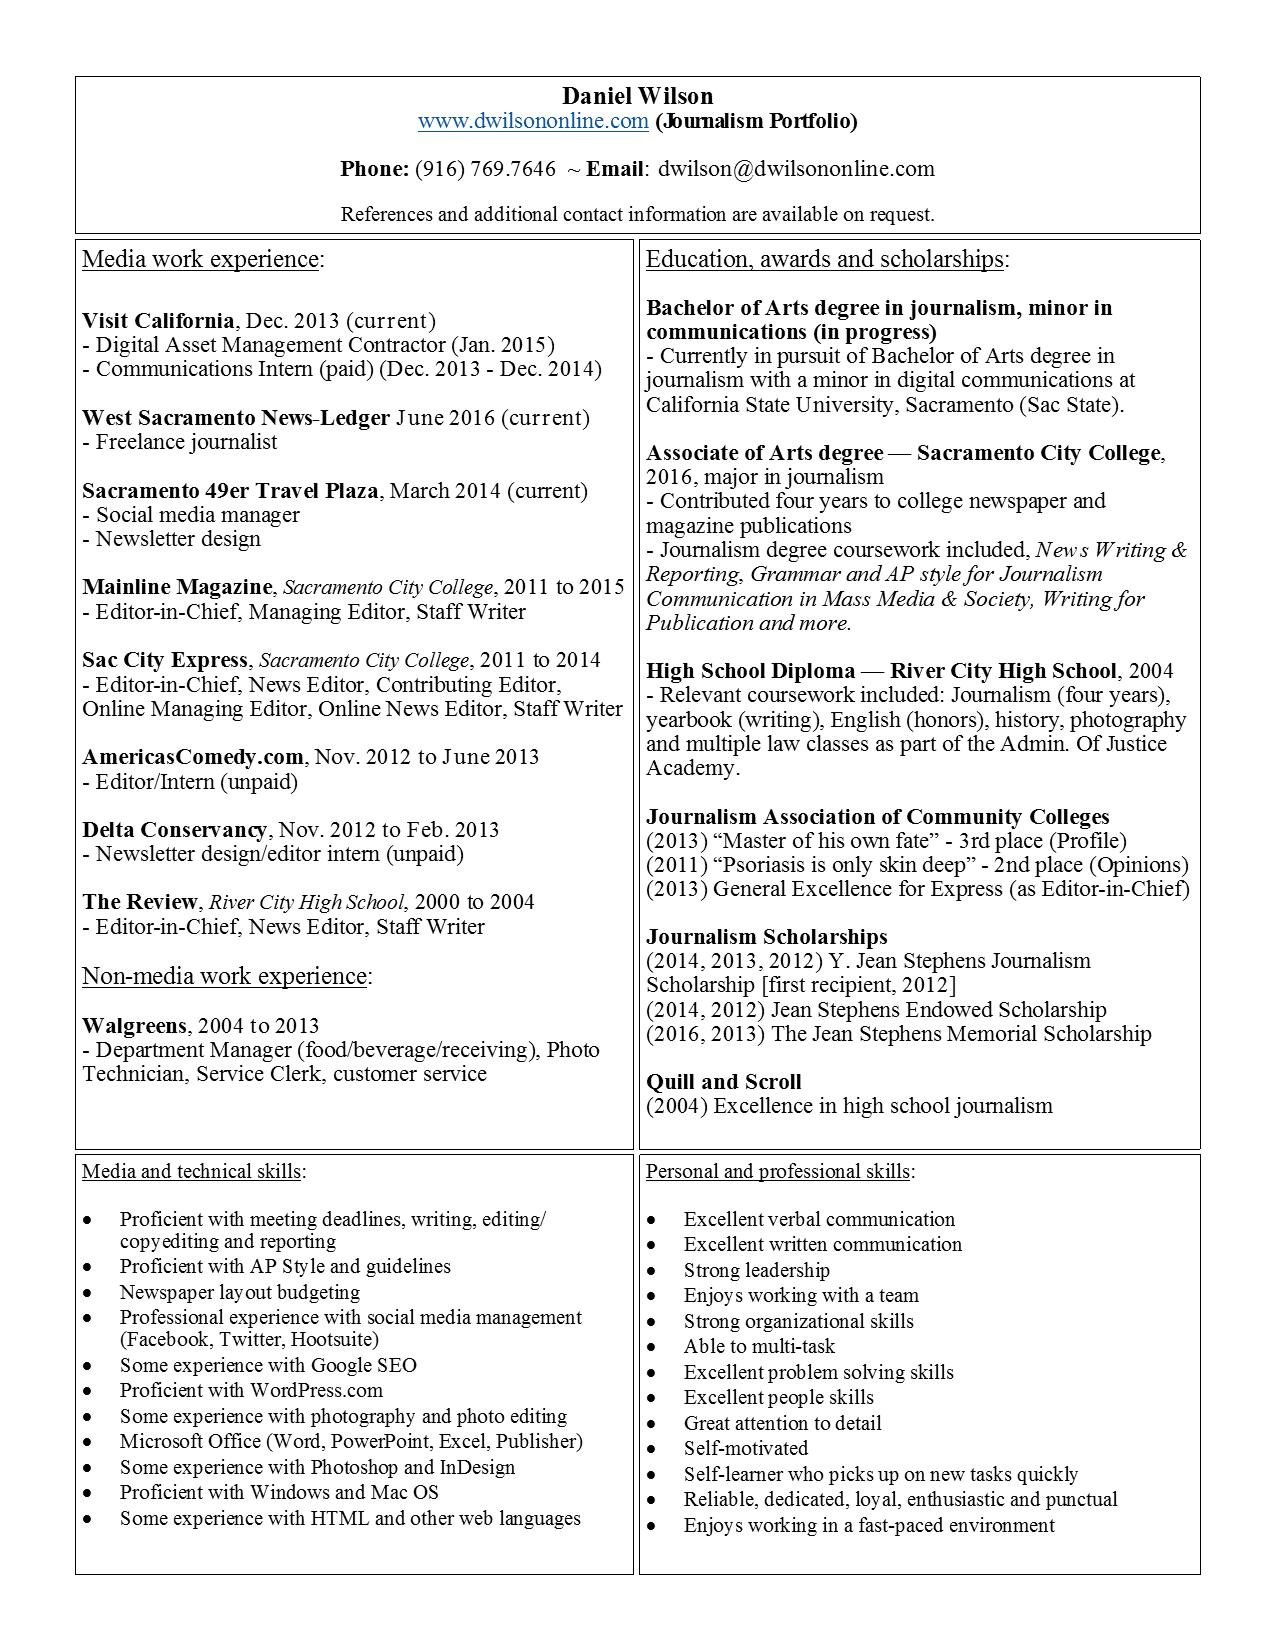 resume daniel wilson